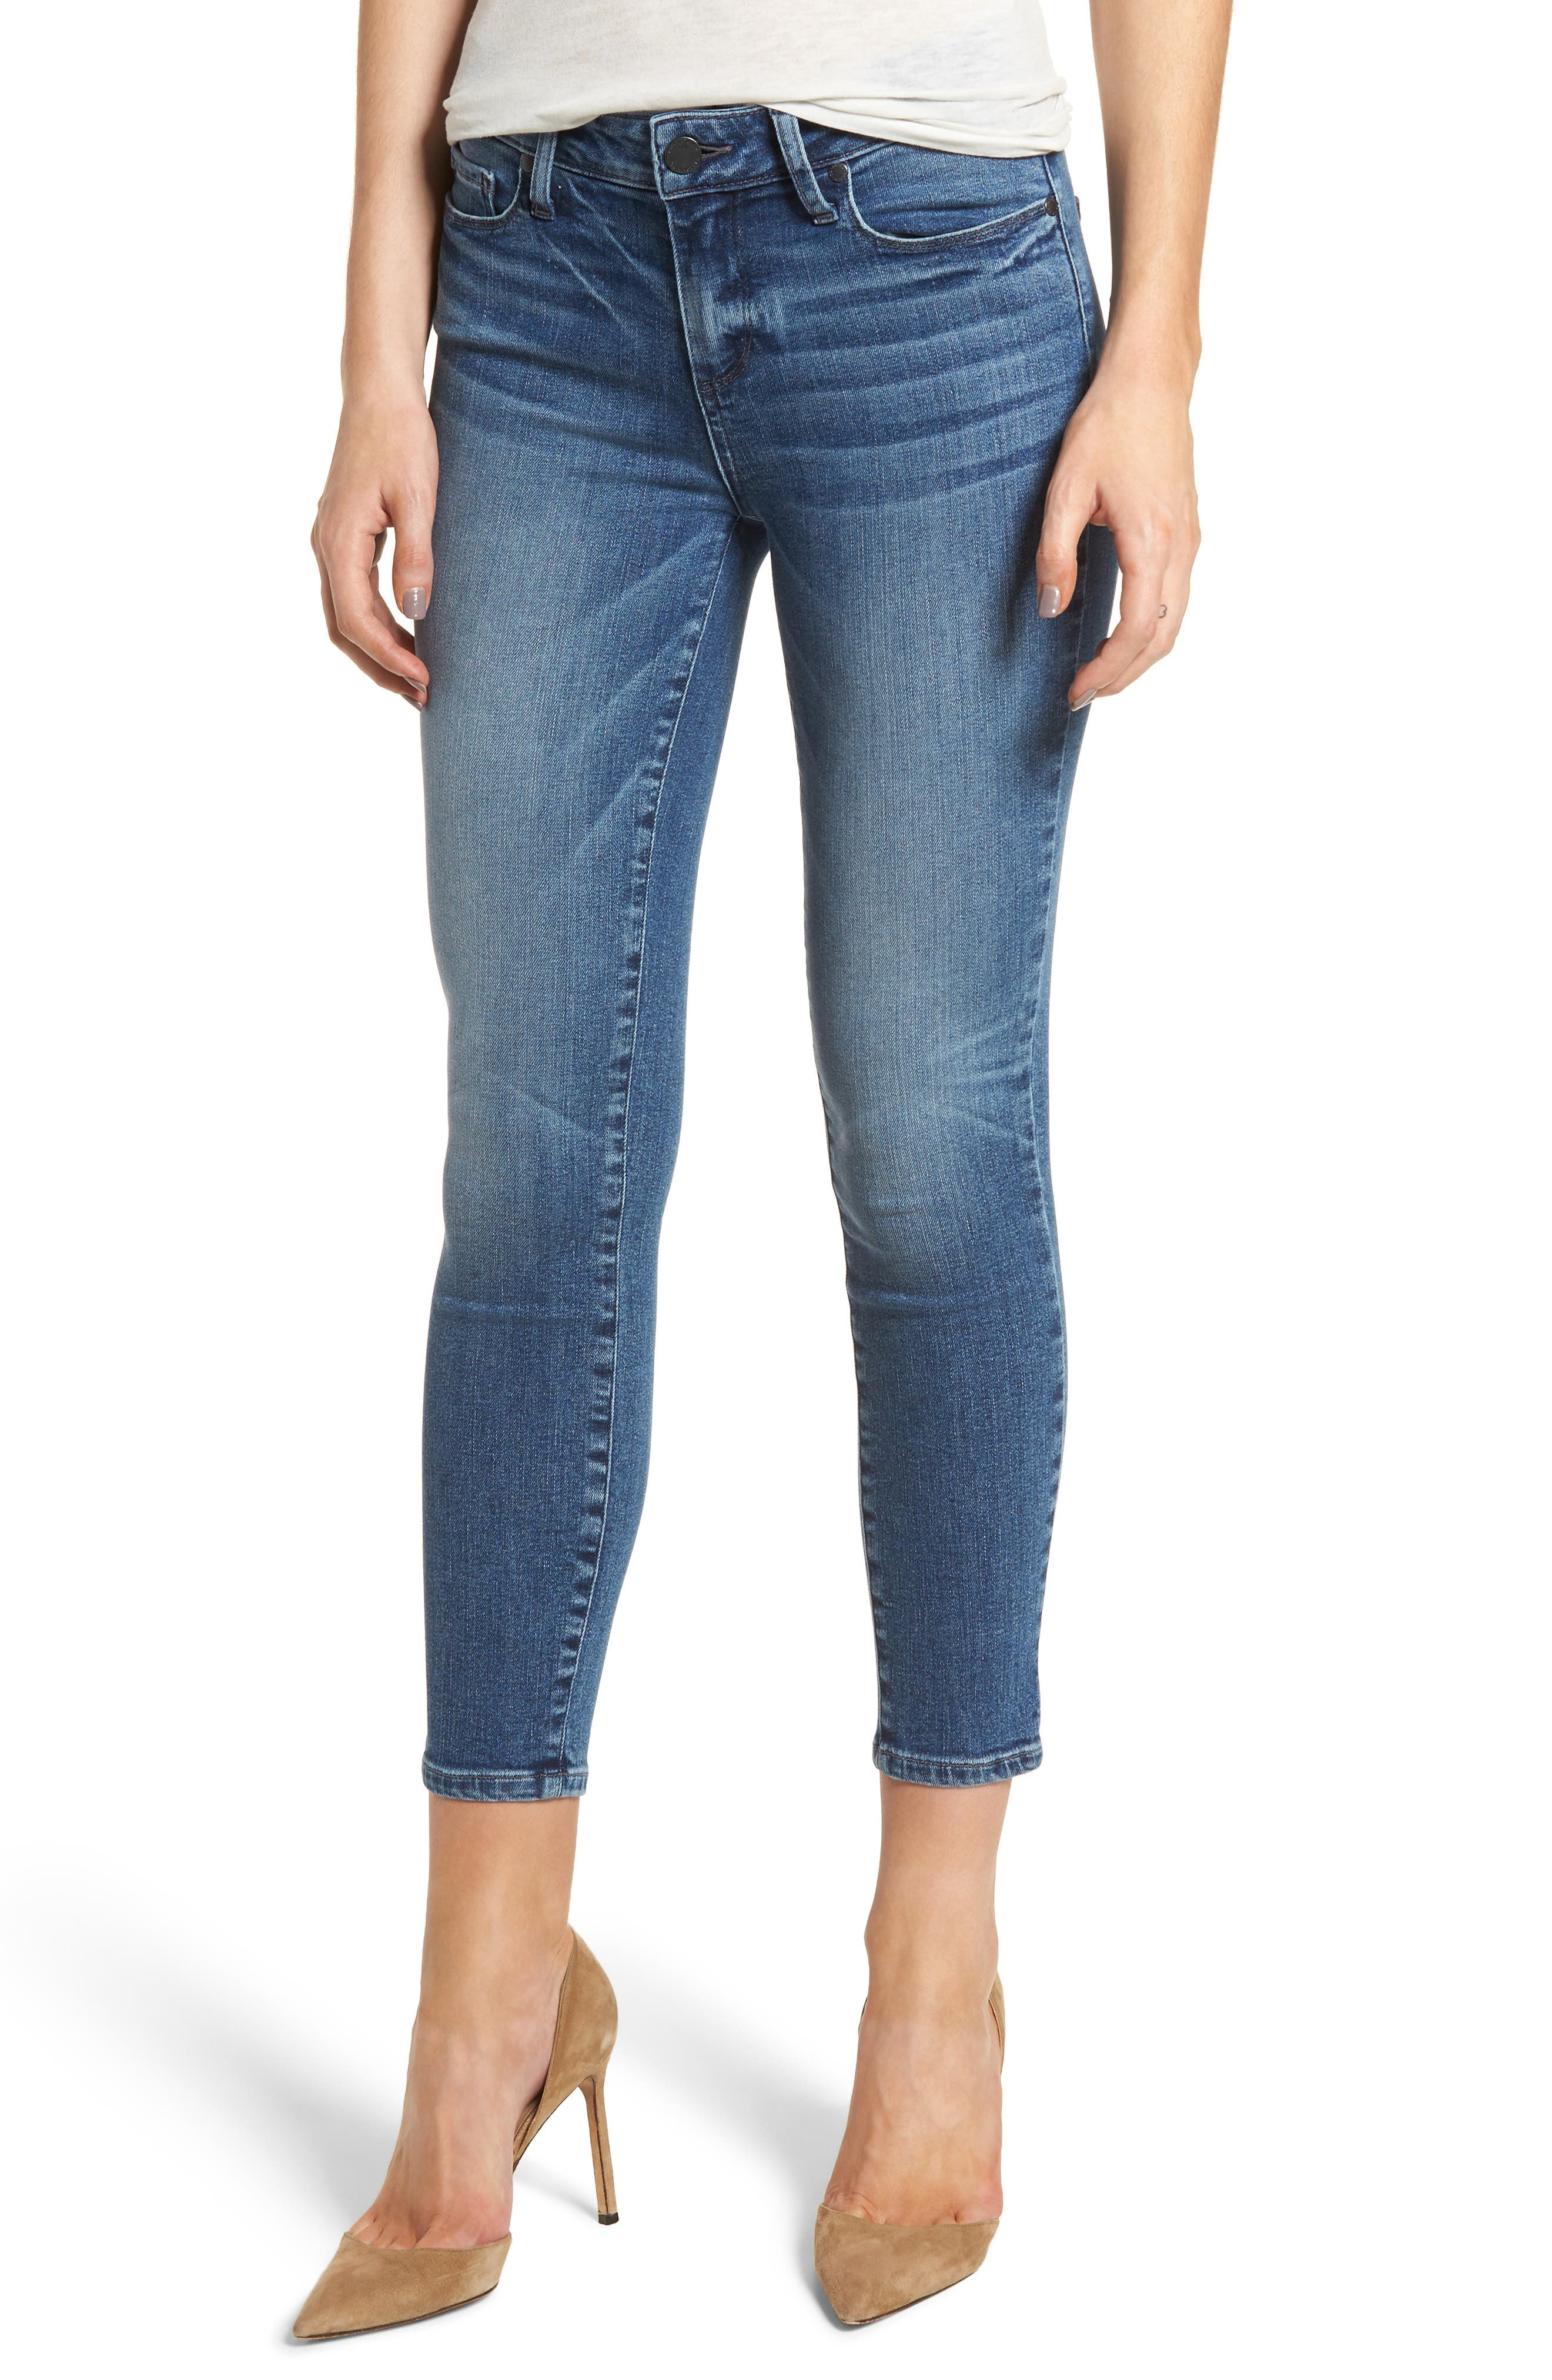 Transcend Vintage - Verdugo Crop Ultra Skinny Jeans,                             Main thumbnail 1, color,                             400